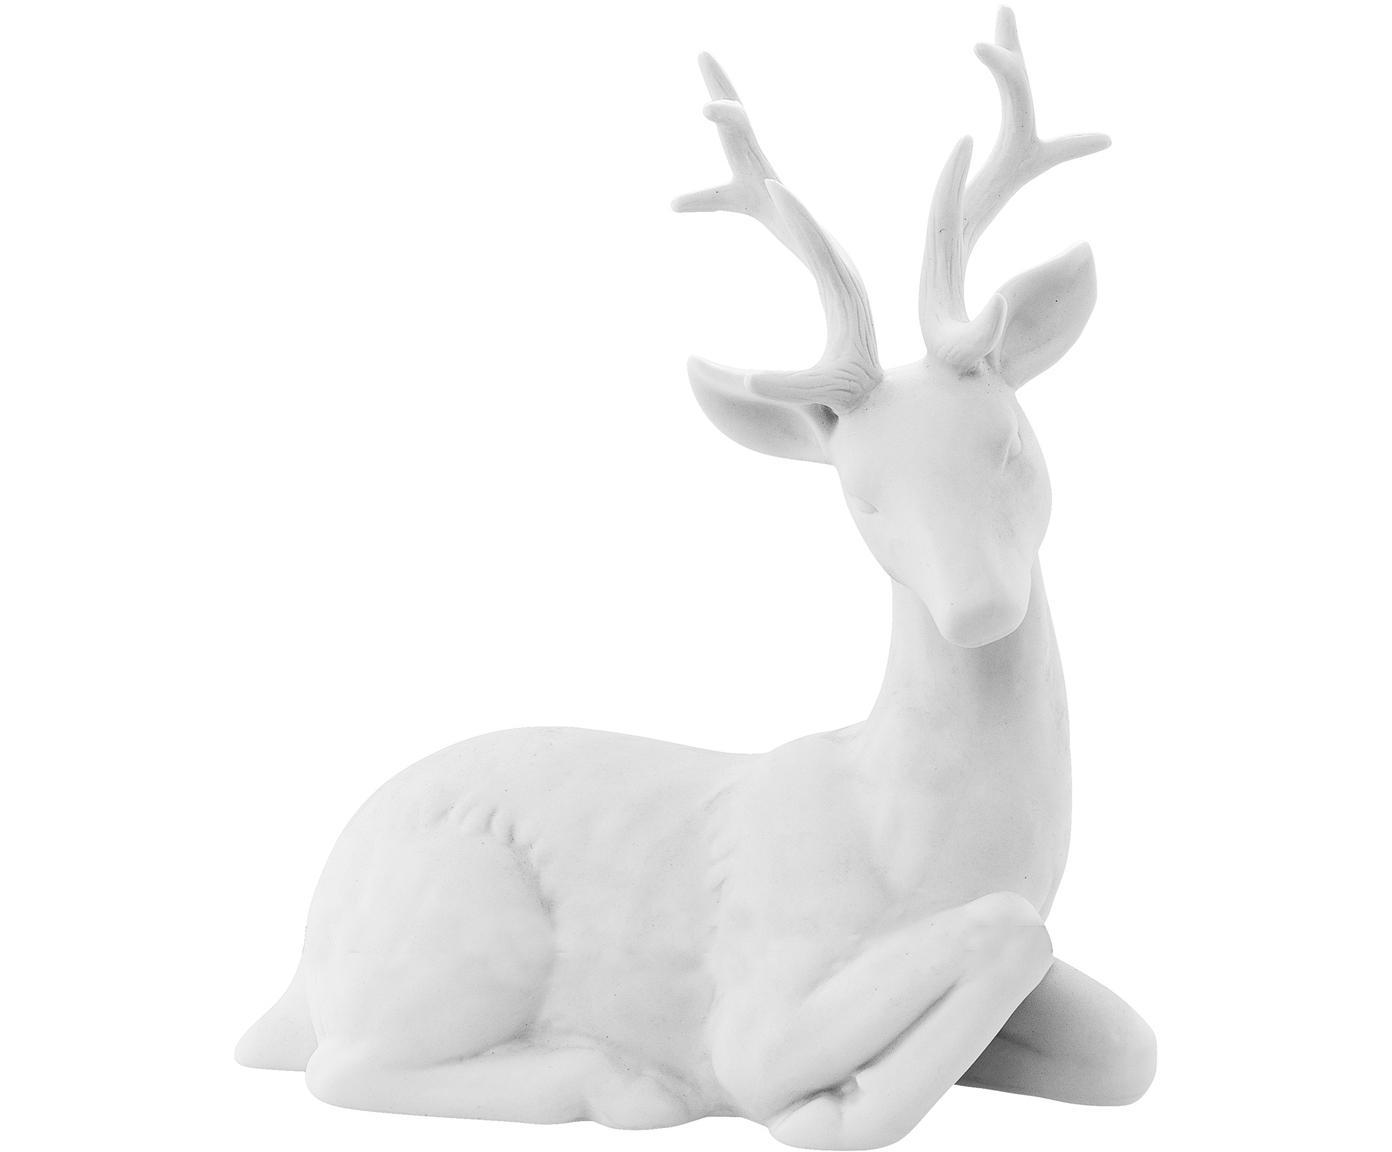 Deko-Objekt Reindeer, Porzellan, Weiß, 19 x 22 cm